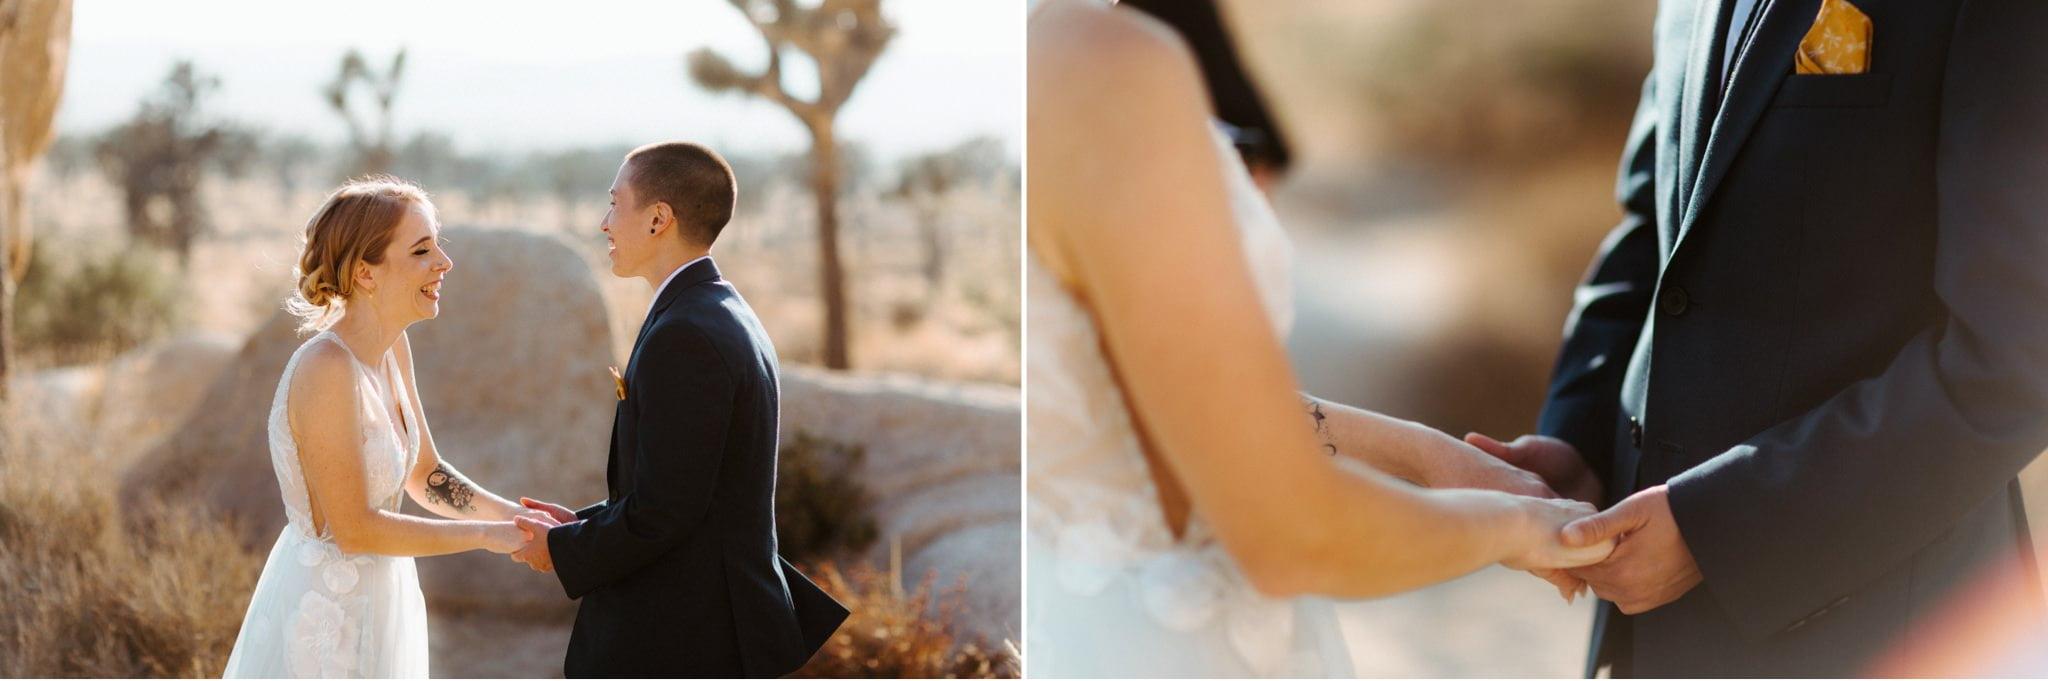 joshua tree wedding 052